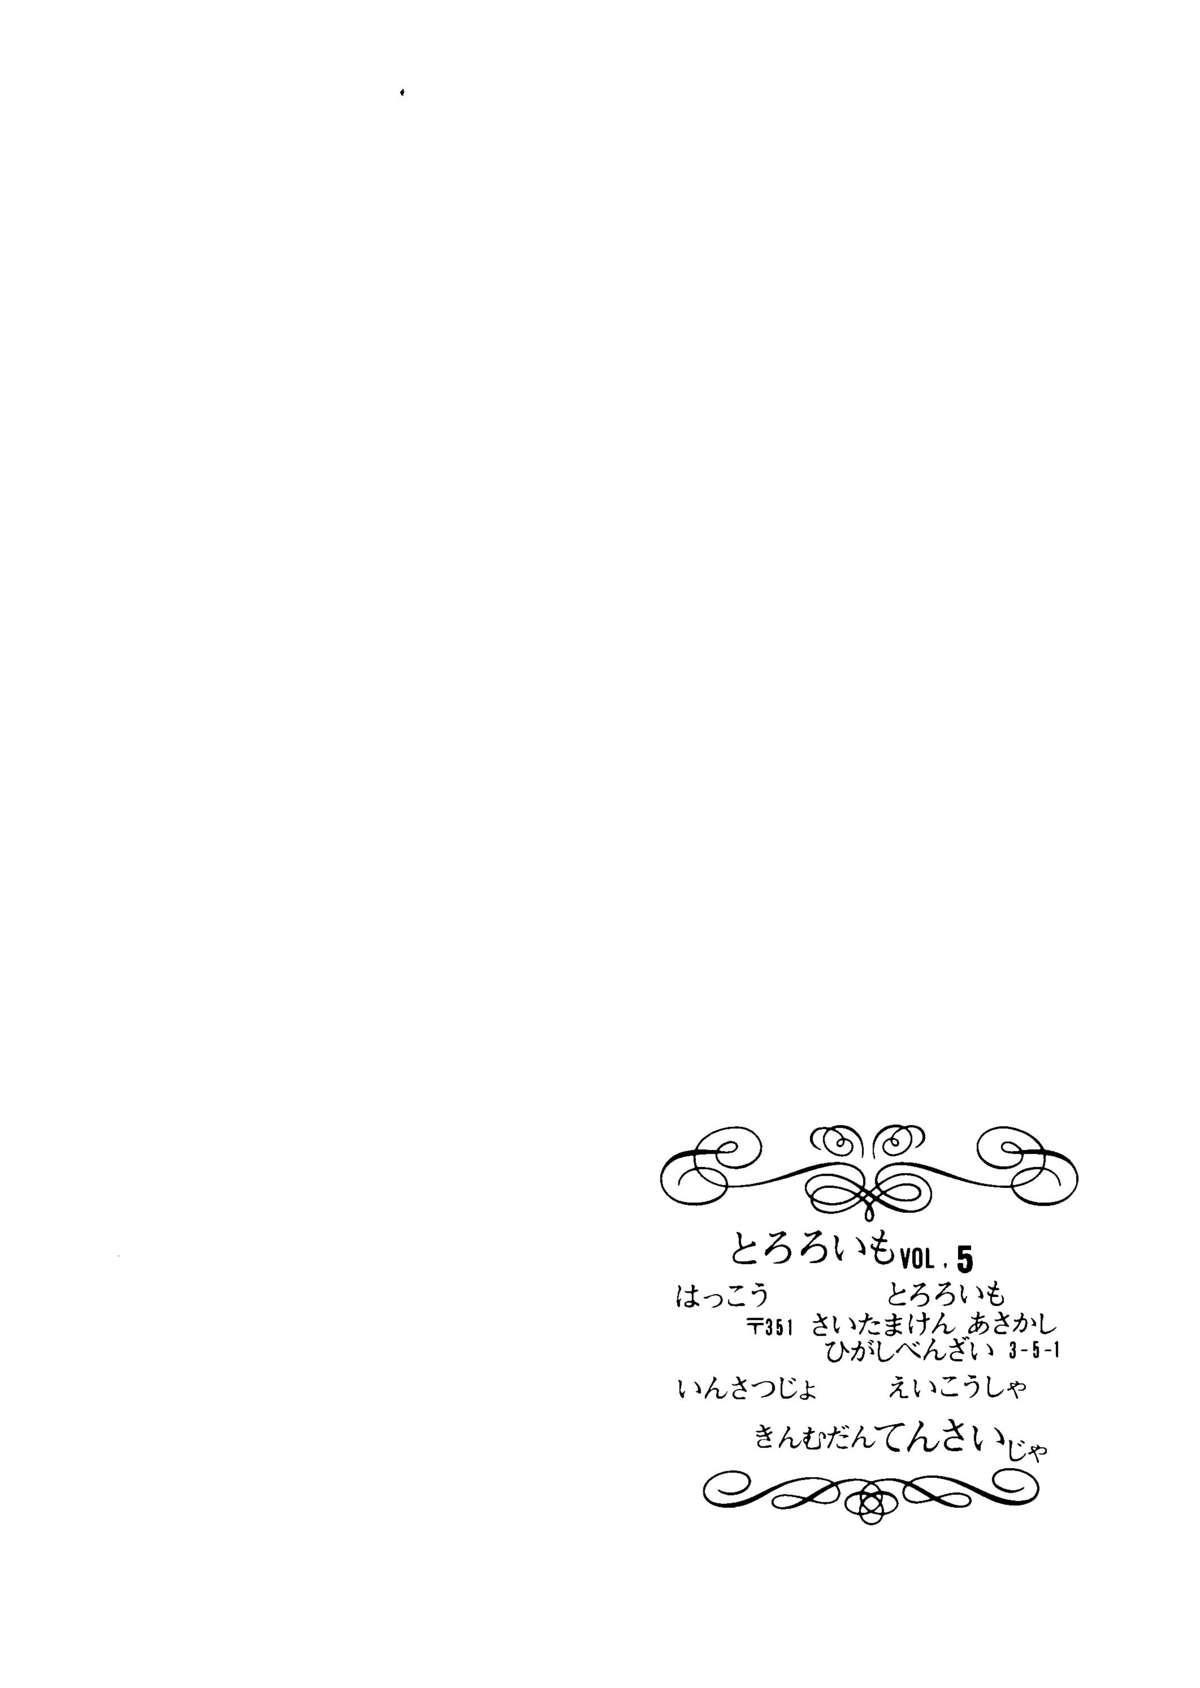 Tororoimo Vol. 5 52